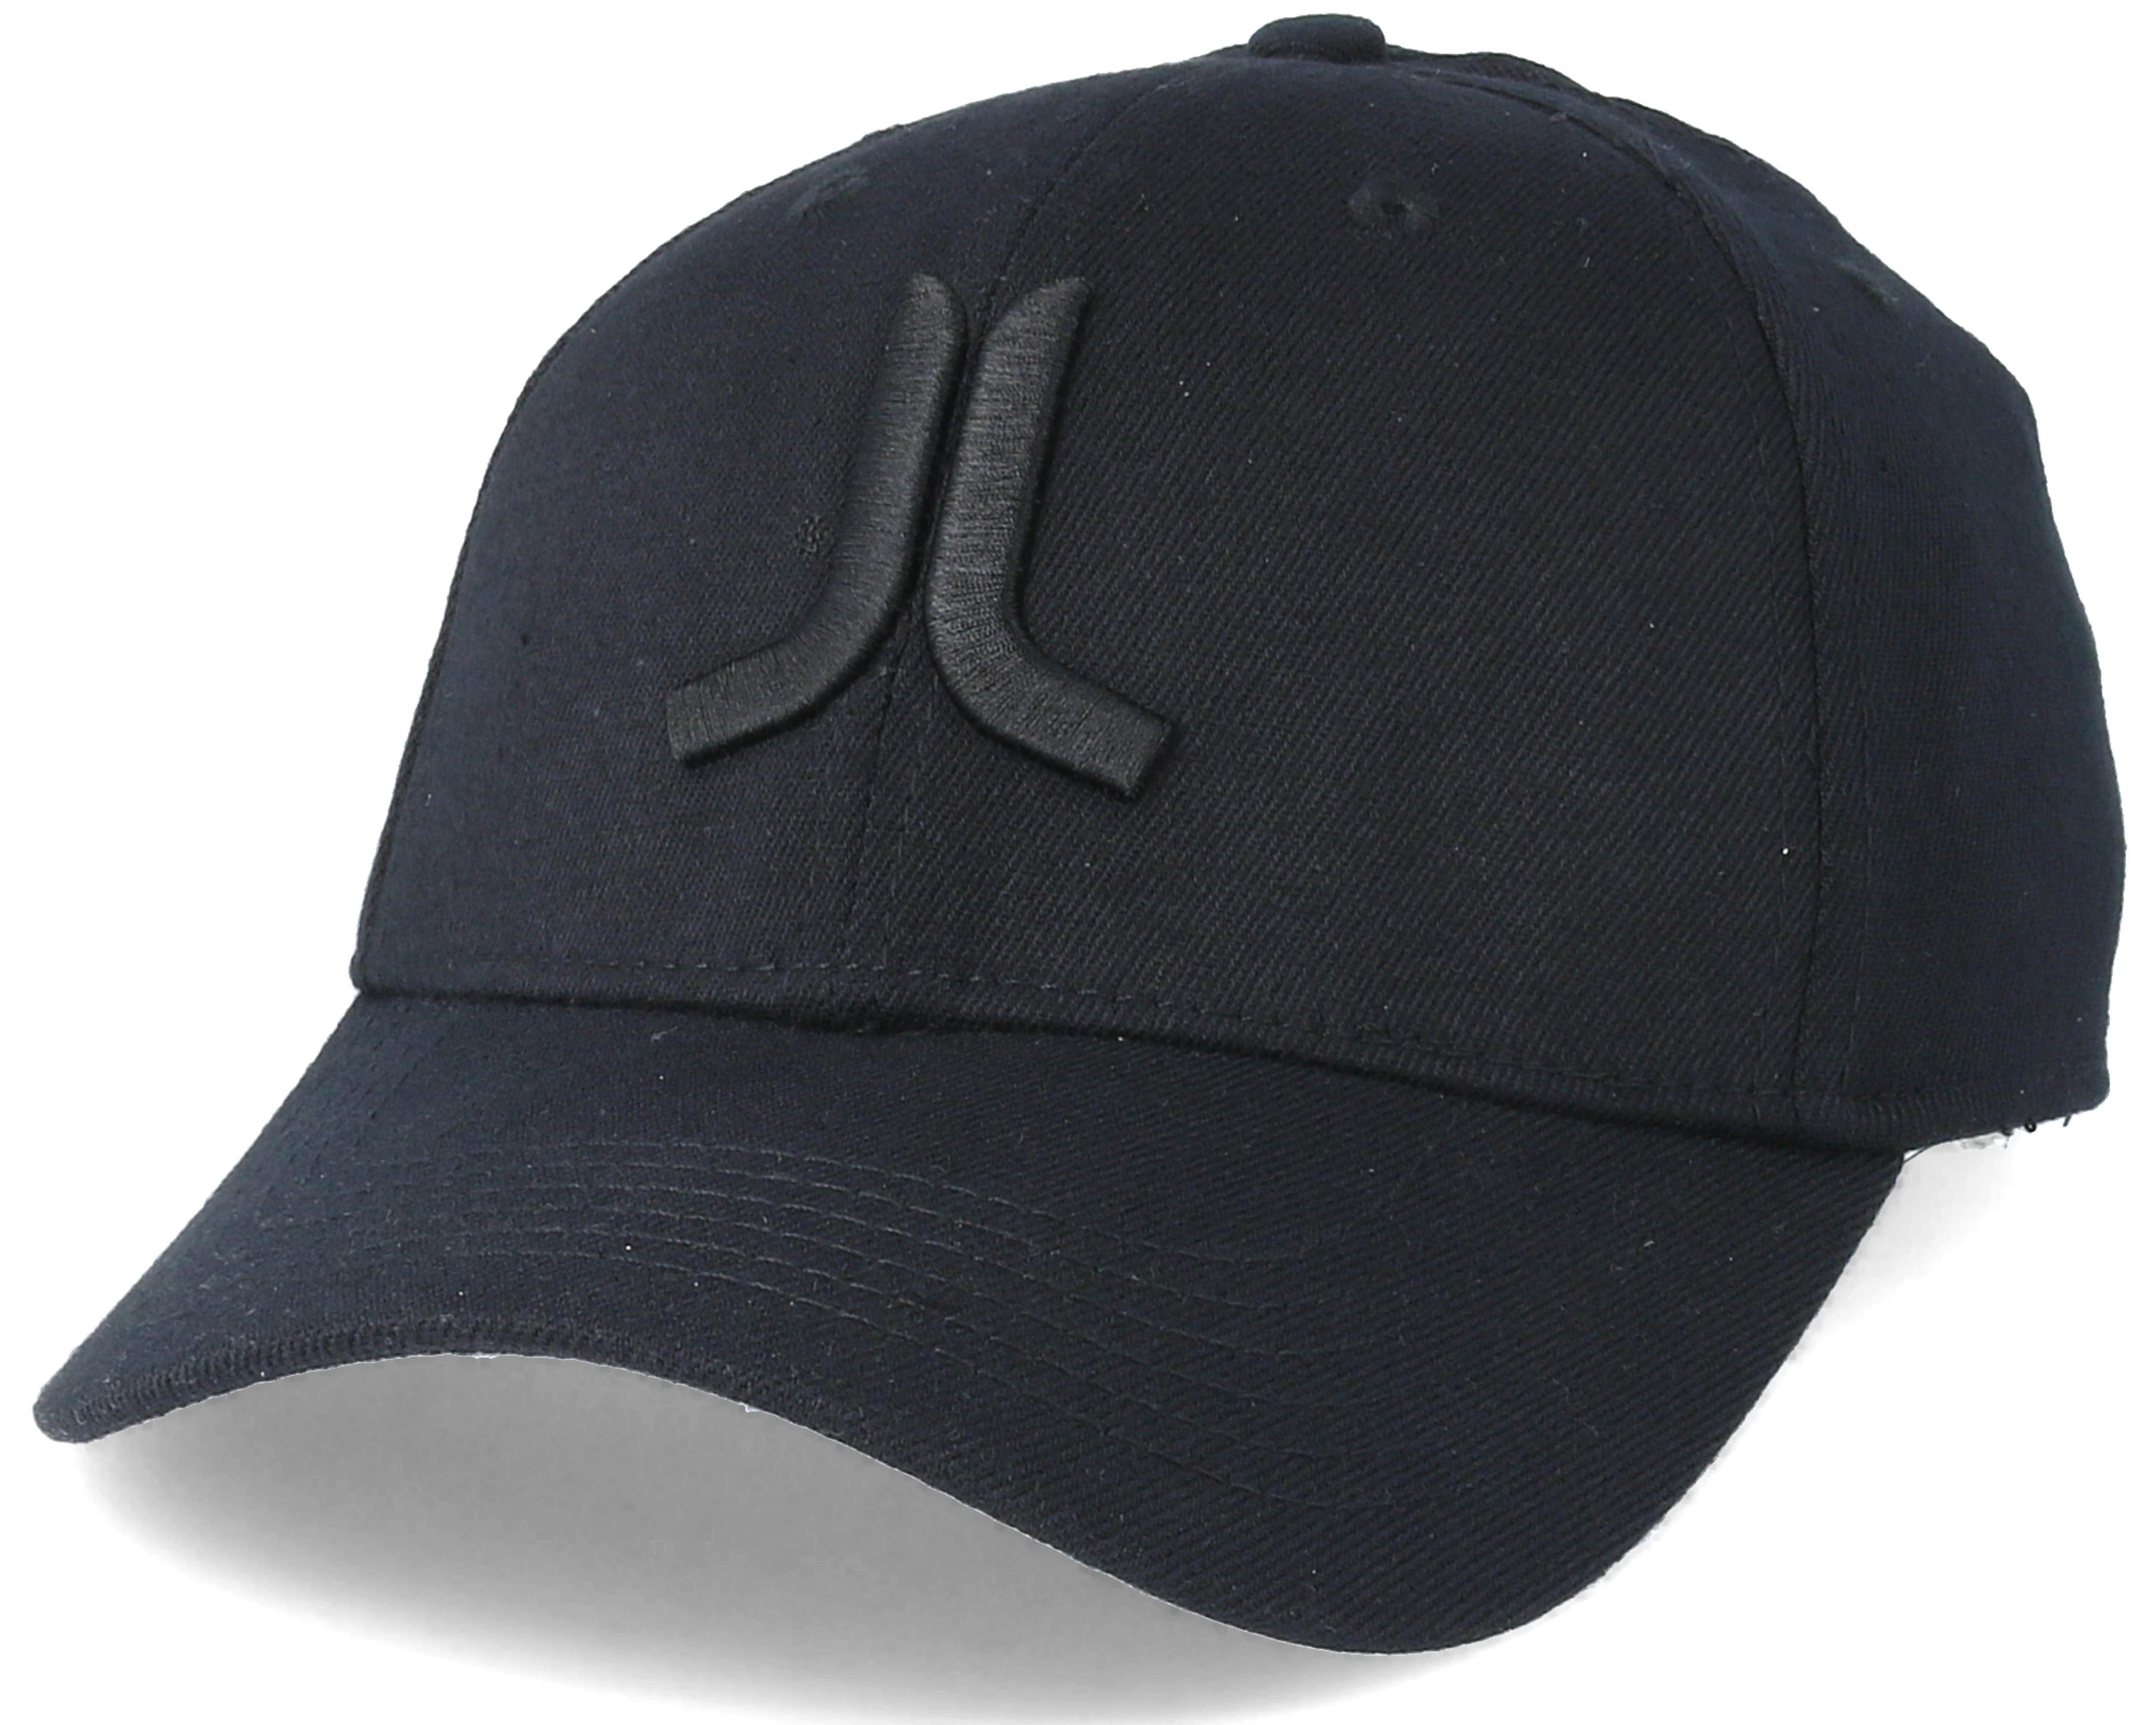 f29e5a334ee Icon Black Flexfit - Wesc lippis - Hatstore.fi